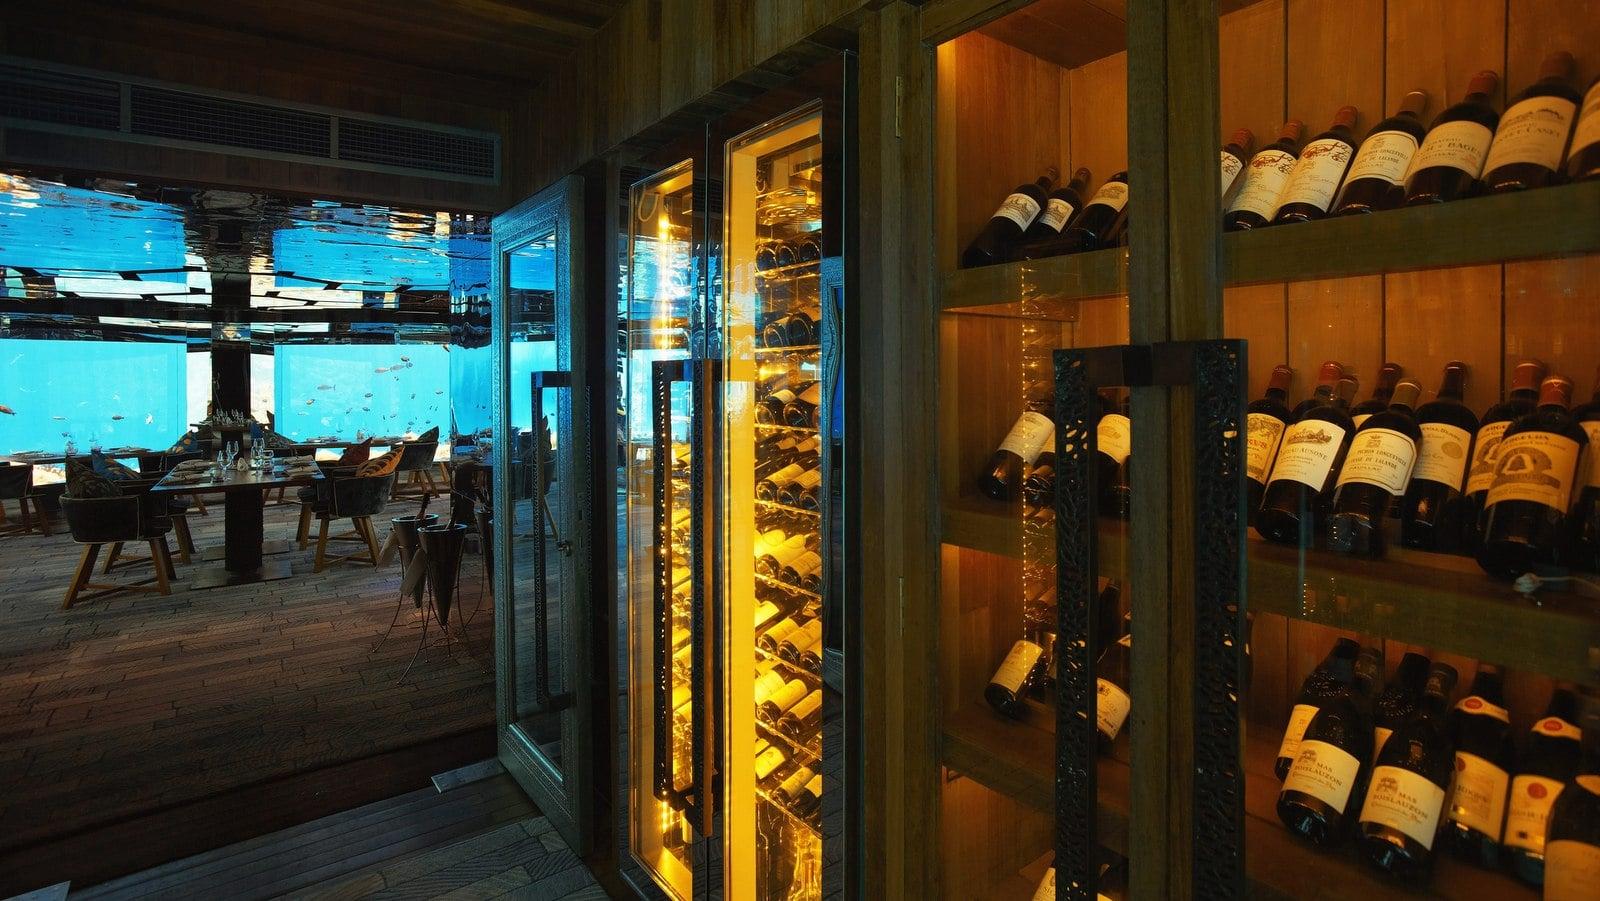 Мальдивы, отель Anantara Kihavah Maldives Villas, ресторан Sea